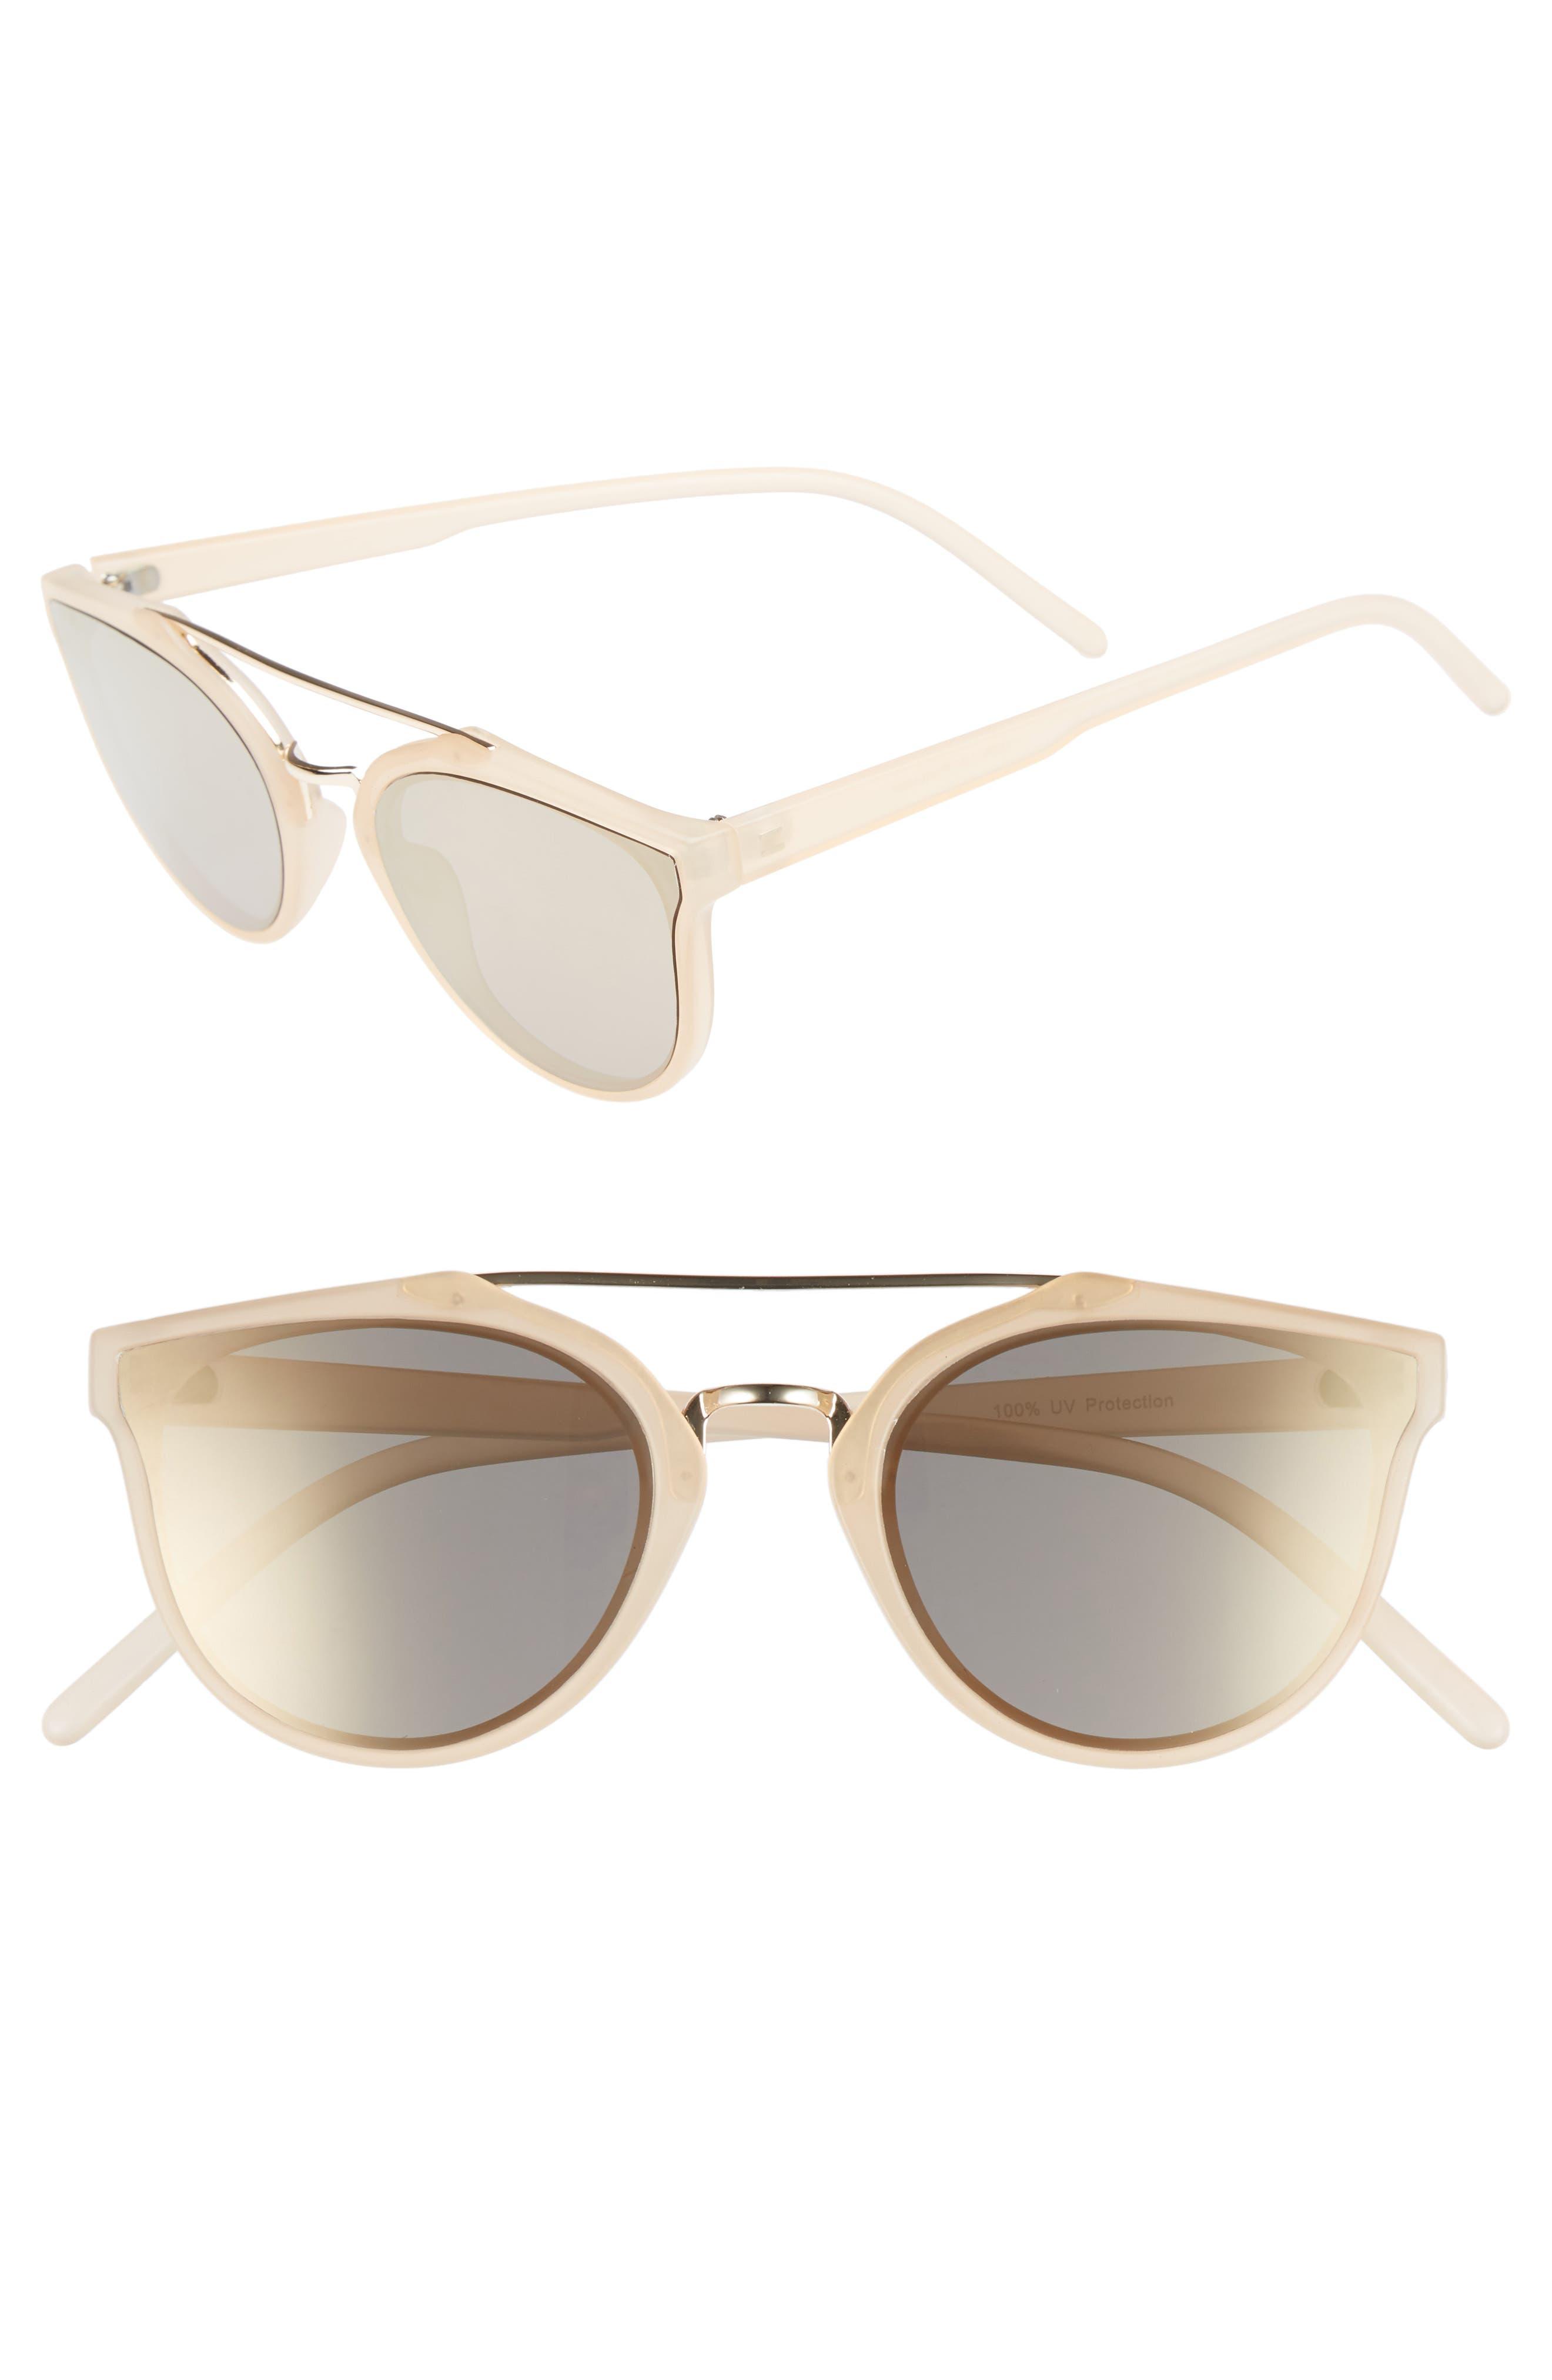 Aviator Sunglasses,                         Main,                         color, Milky Peach/ Gold